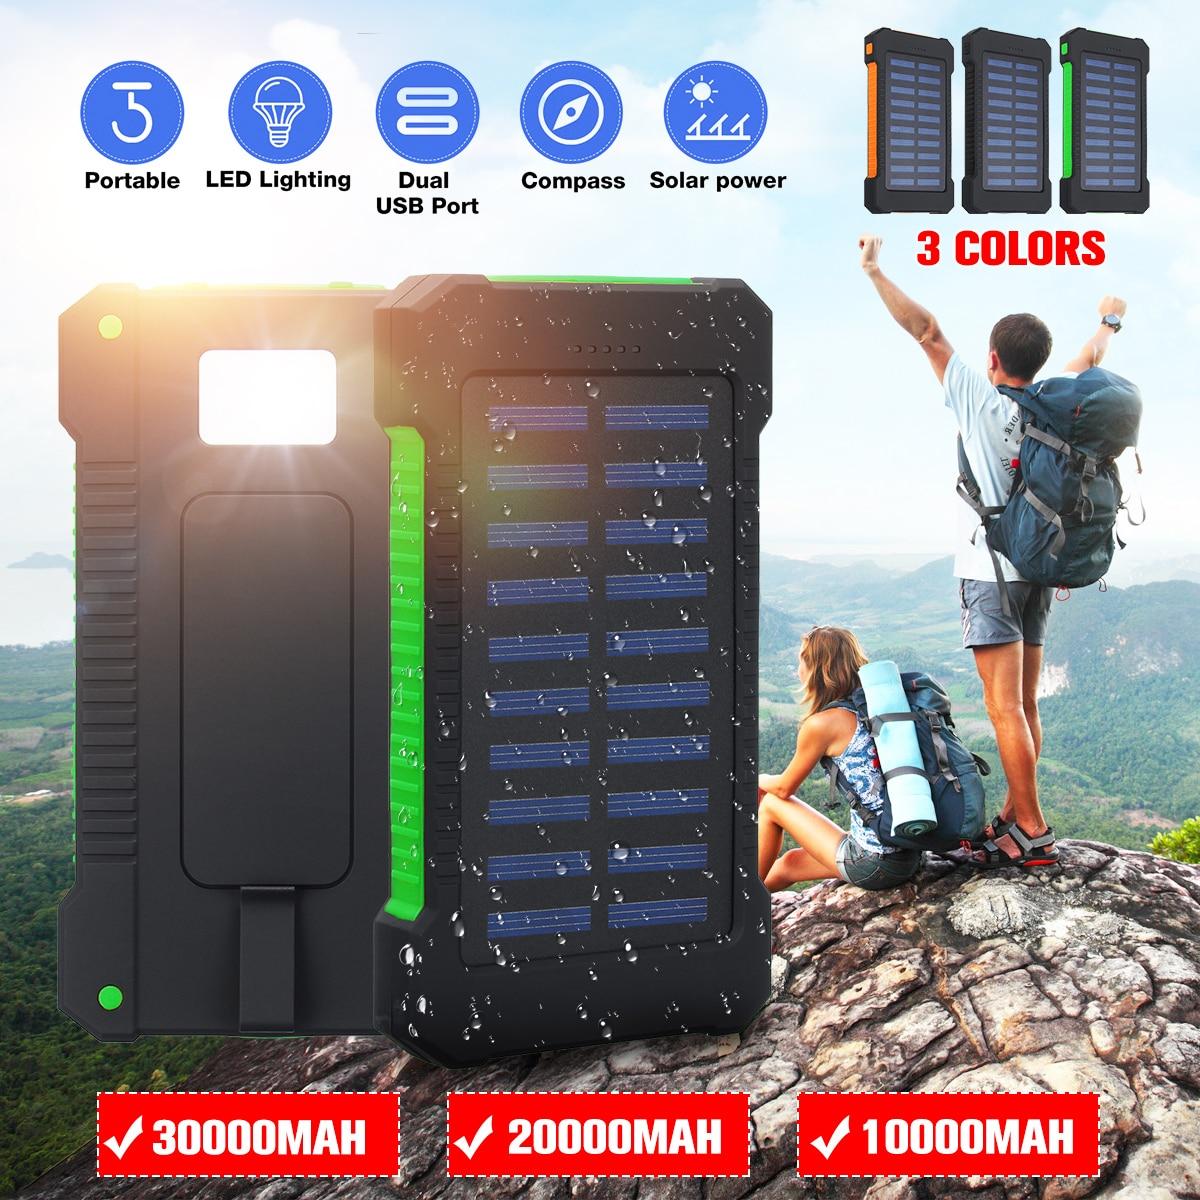 Cargador Solar impermeable del Banco de la energía Solar de 30000 mah/20000 mah con la luz del LED de las compresas 2 cargador externo del viaje del Usb